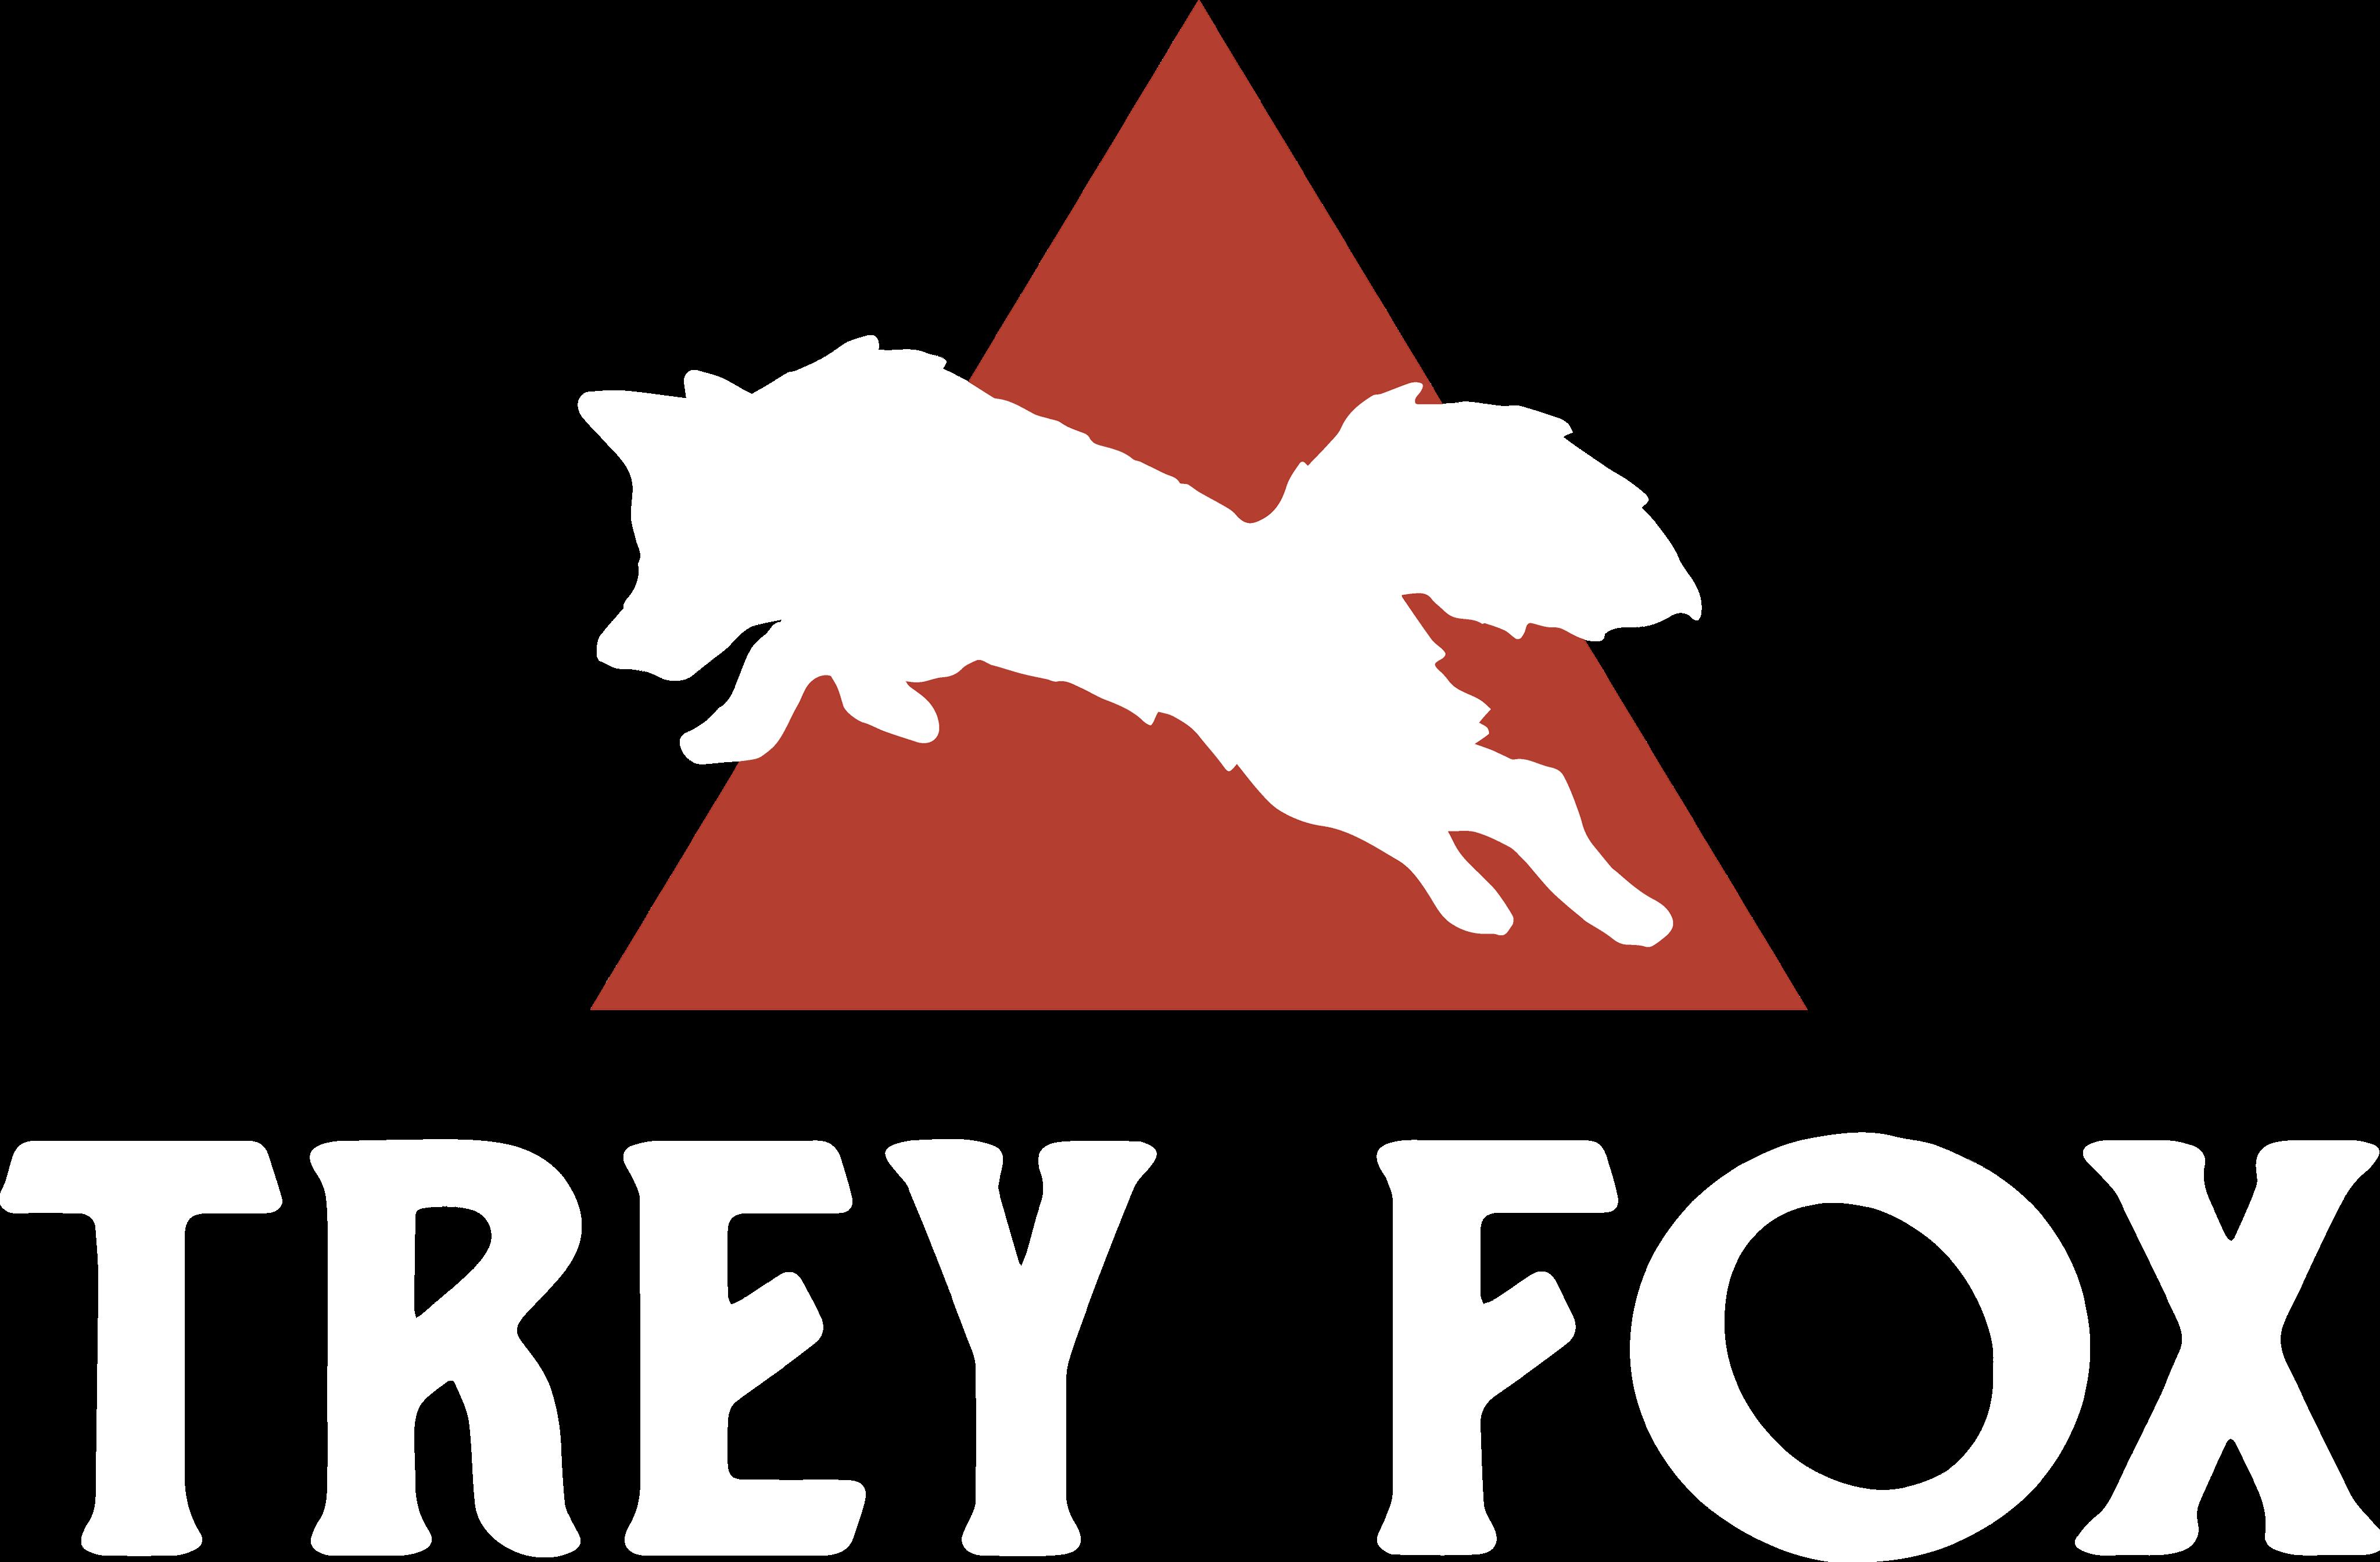 Trey Fox Design